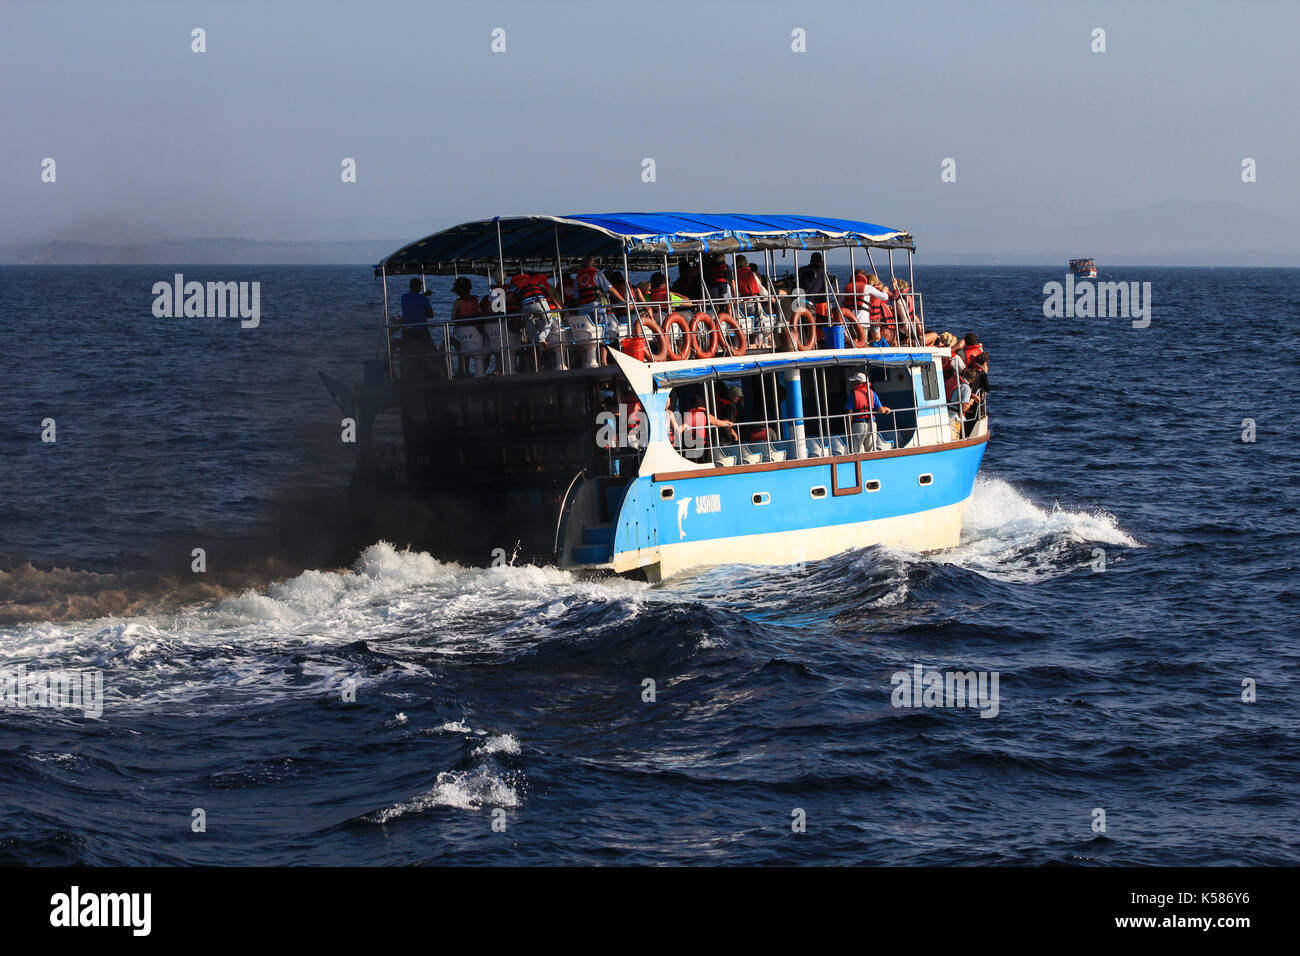 Unawatuna, Sri Lanka - January 9, 2017: A tourist boat producing black smoke and poluting the sea, during a whale watching tour. - Stock Image